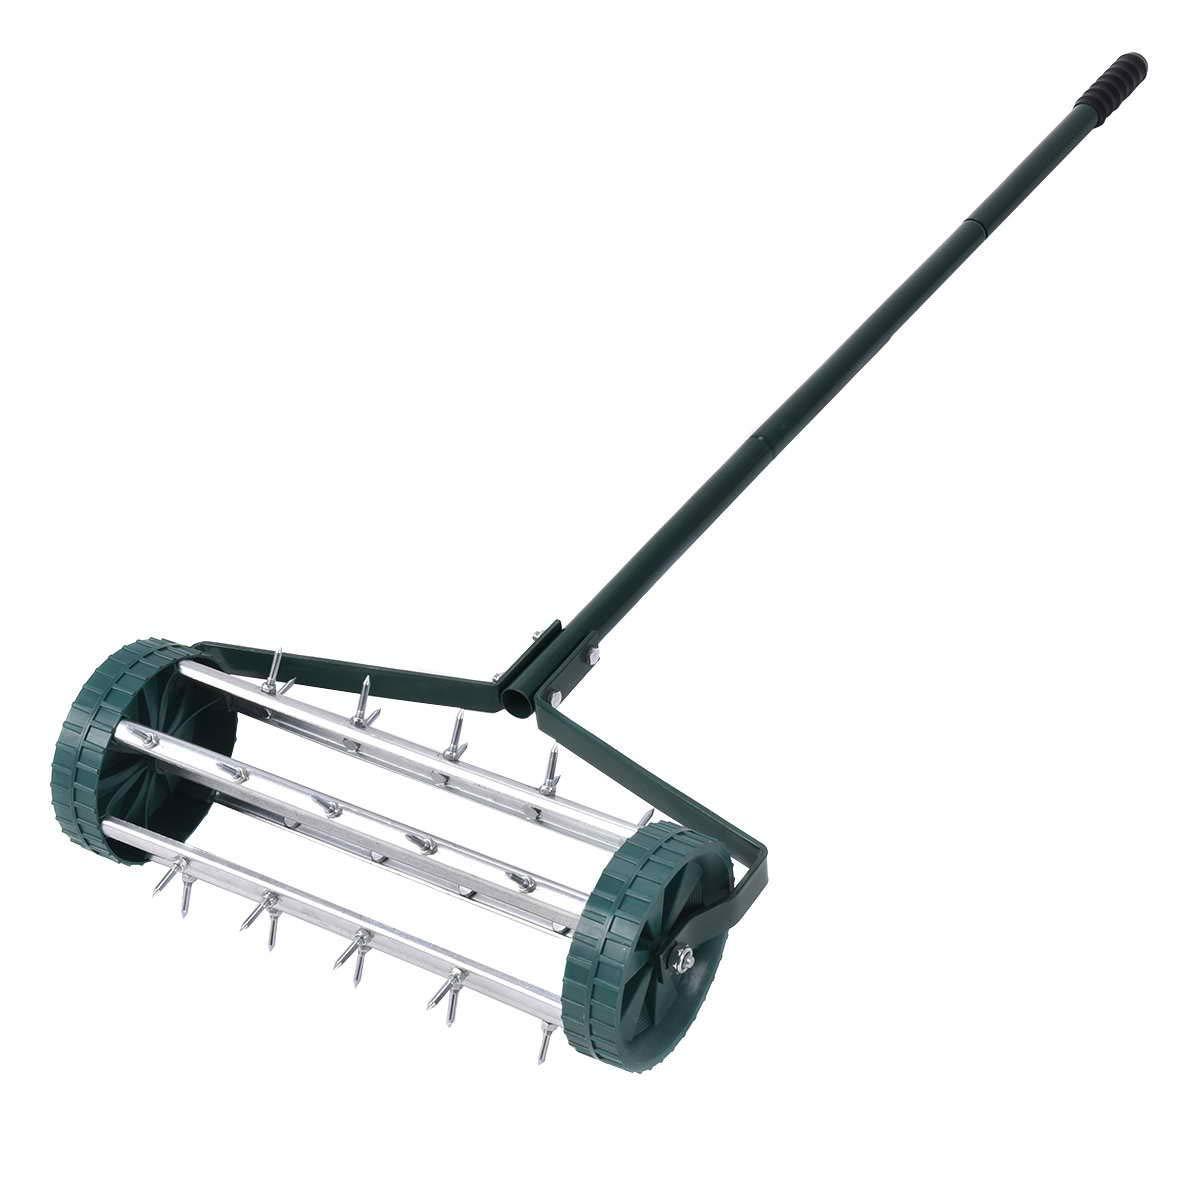 Rolling Lawn Aerator 18-inch Garden Yard Rotary Push Tine Heavy Duty Spike Soil Aeration, 50-in Handle